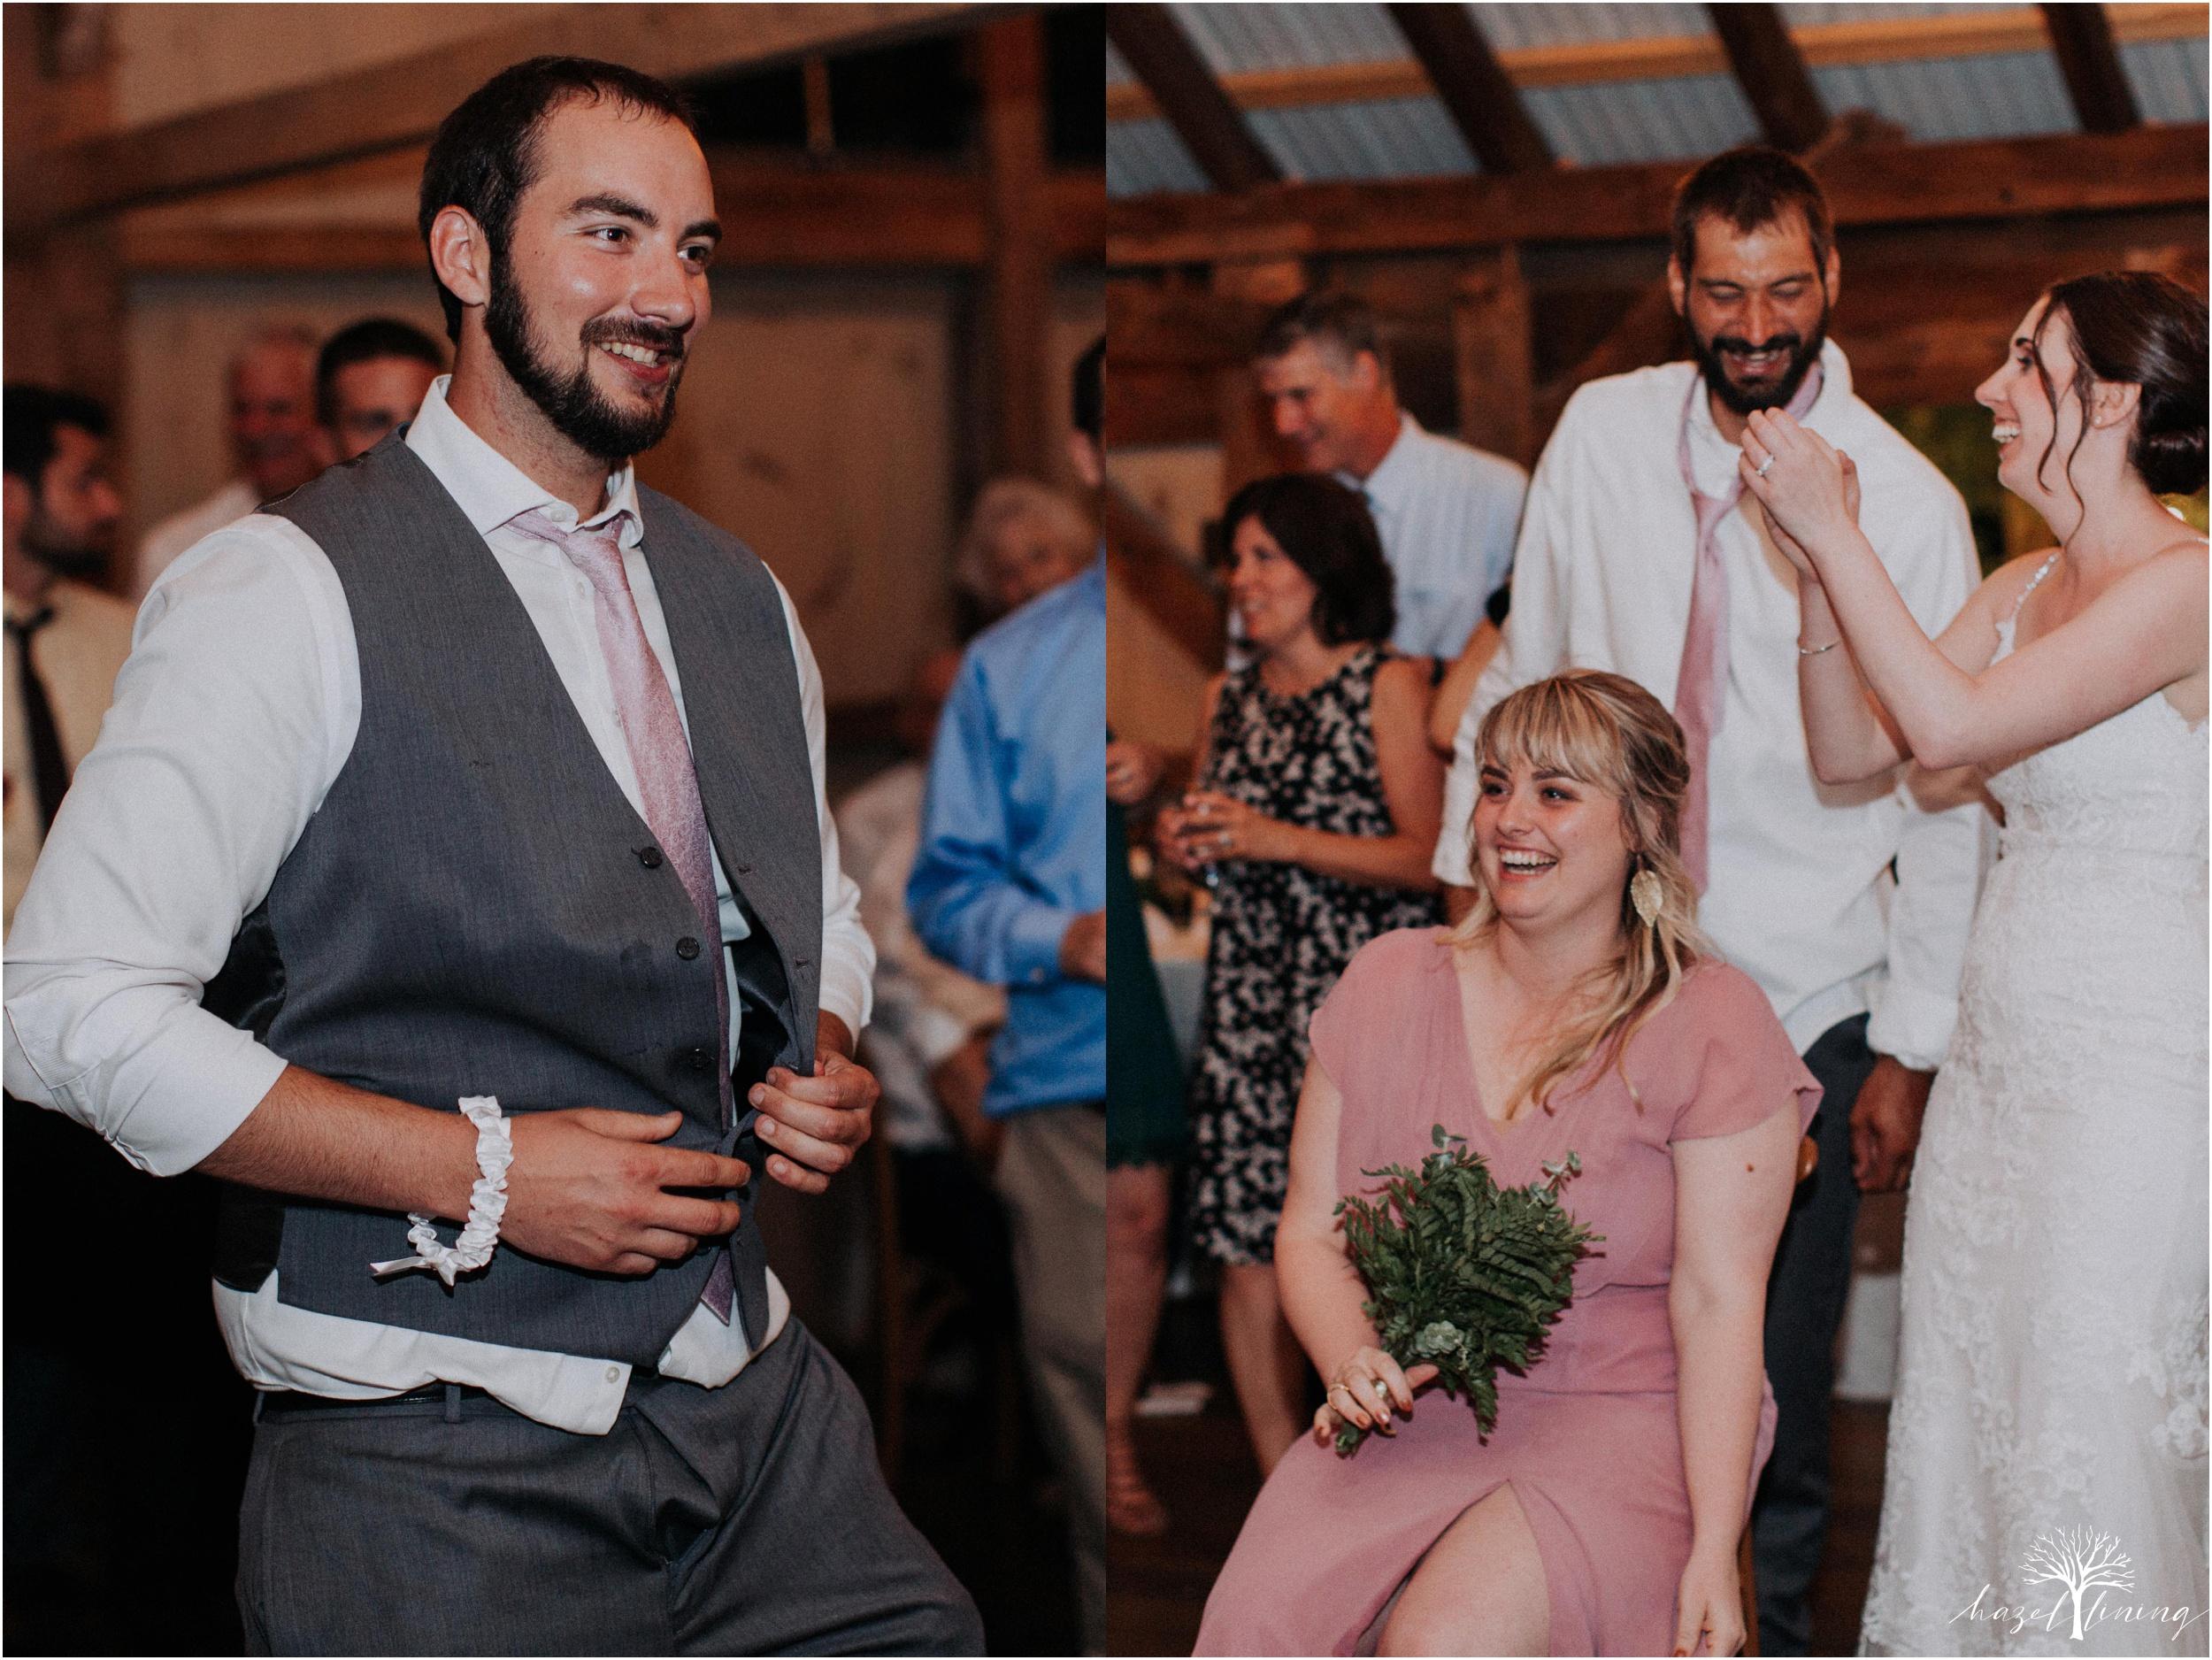 hazel-lining-travel-wedding-elopement-photography-lisa-landon-shoemaker-the-farm-bakery-and-events-bucks-county-quakertown-pennsylvania-summer-country-outdoor-farm-wedding_0170.jpg